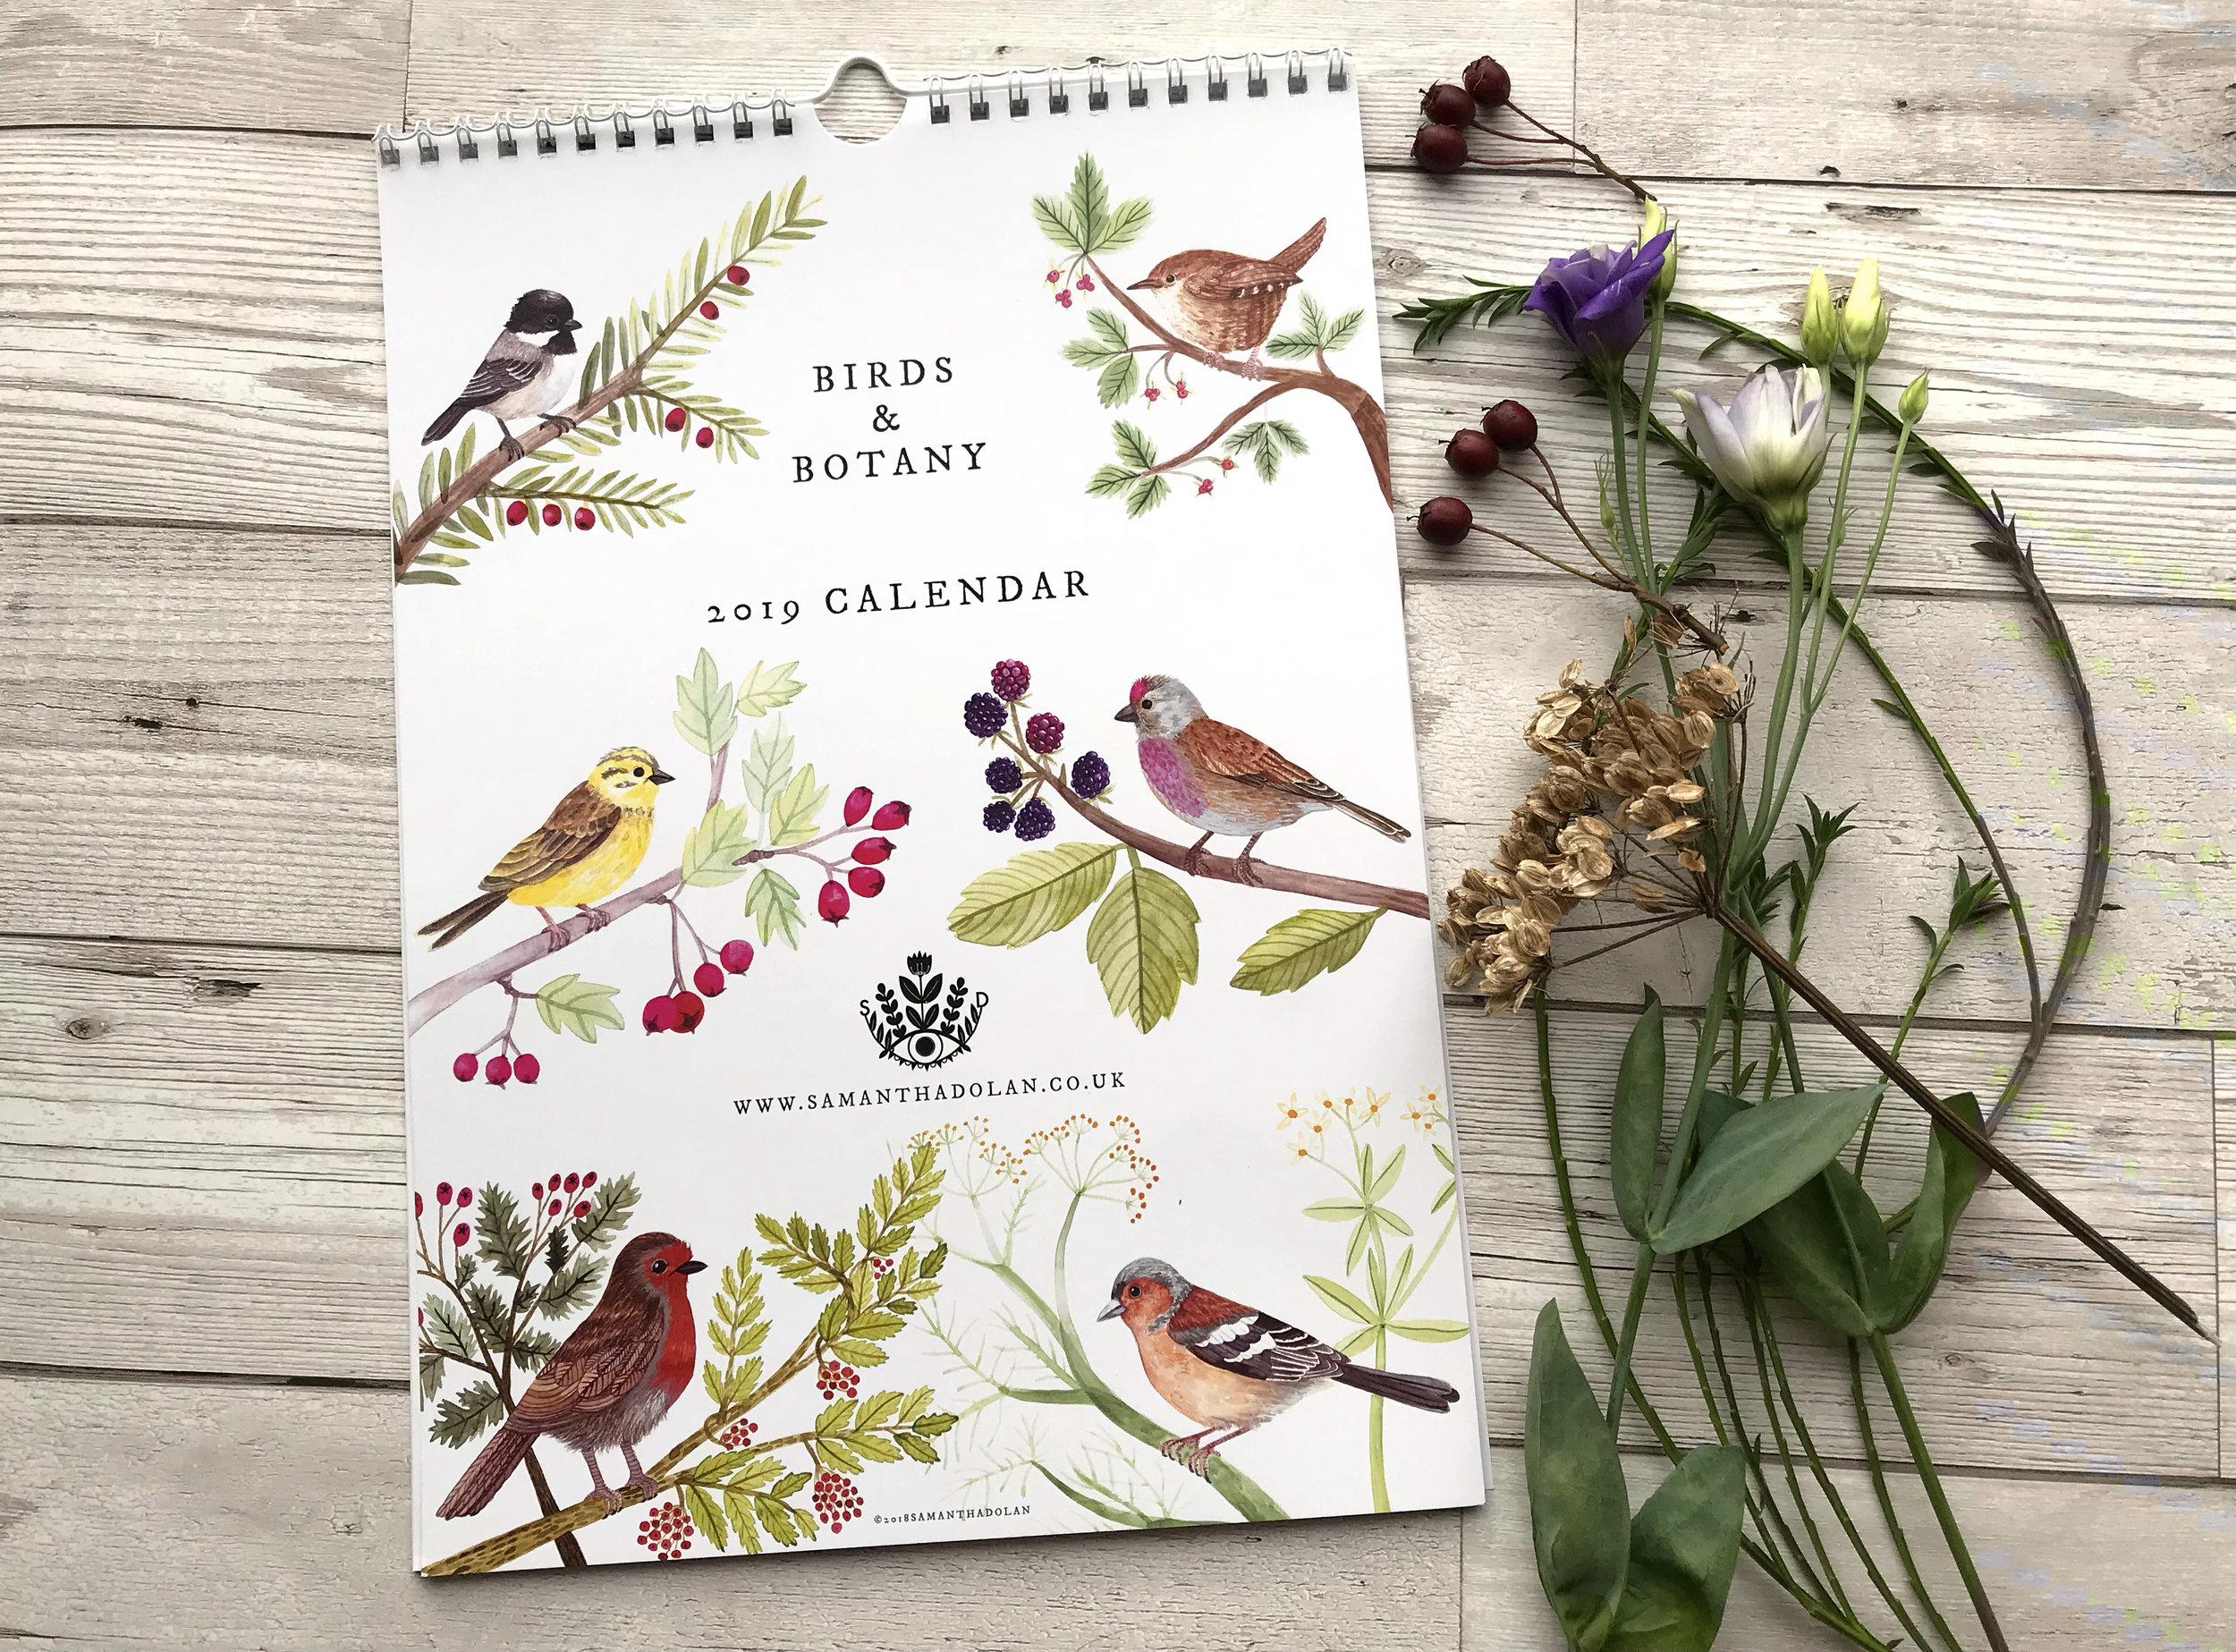 Birds and Botany 2019 Calendar